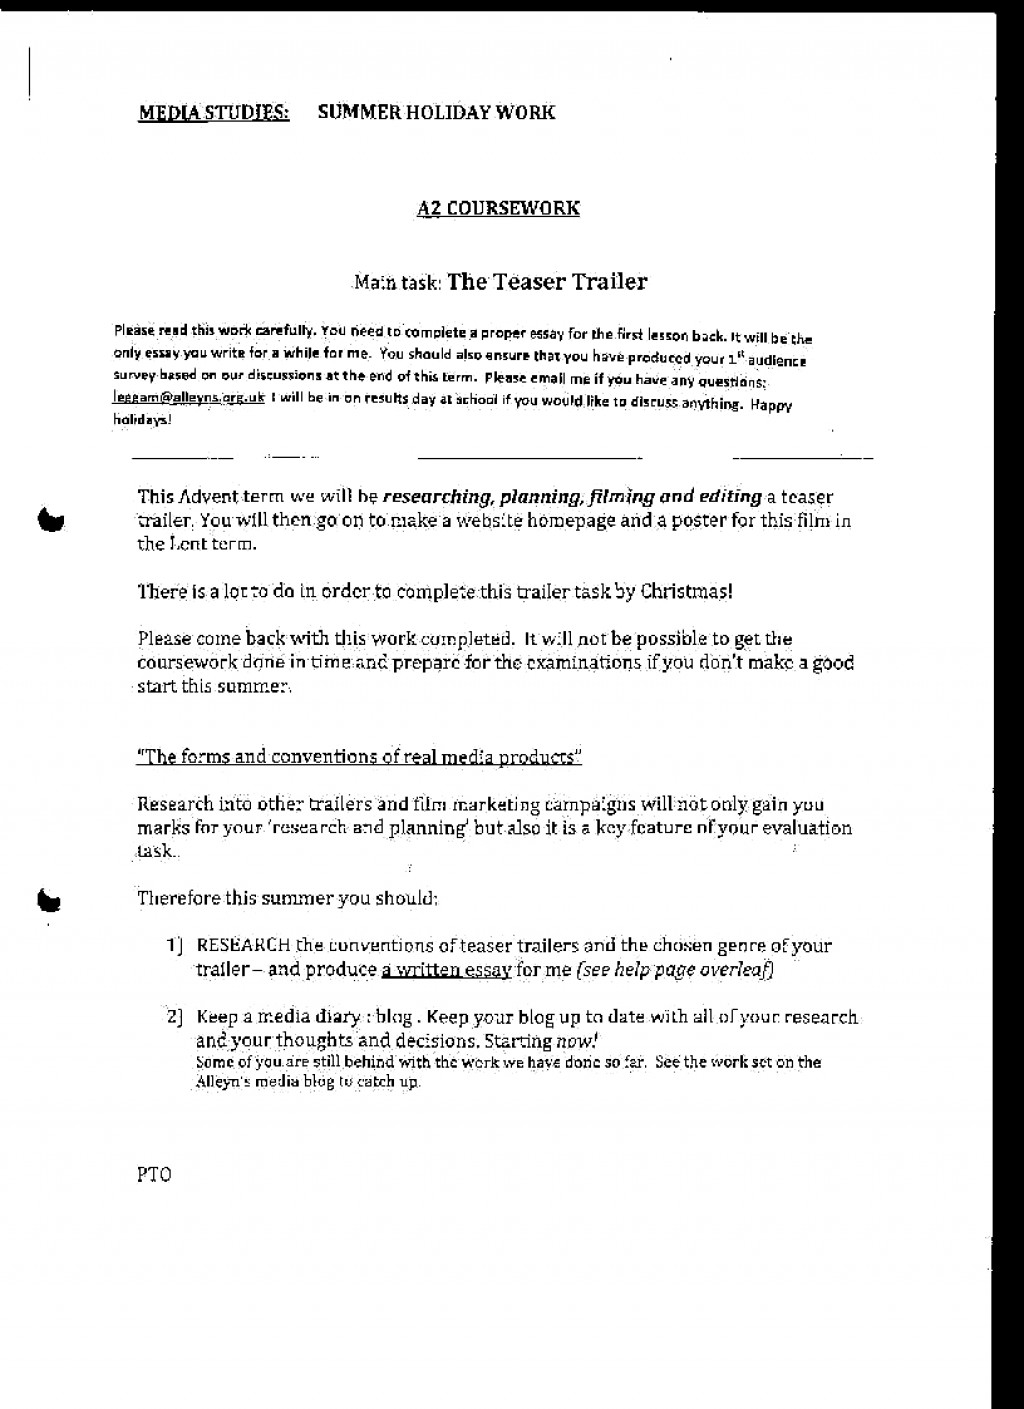 023 Essay Example Yr2b122bholiday2bwork2bpage2b1 Summer Frightening Vacation For Class 6 In Urdu On Marathi Large